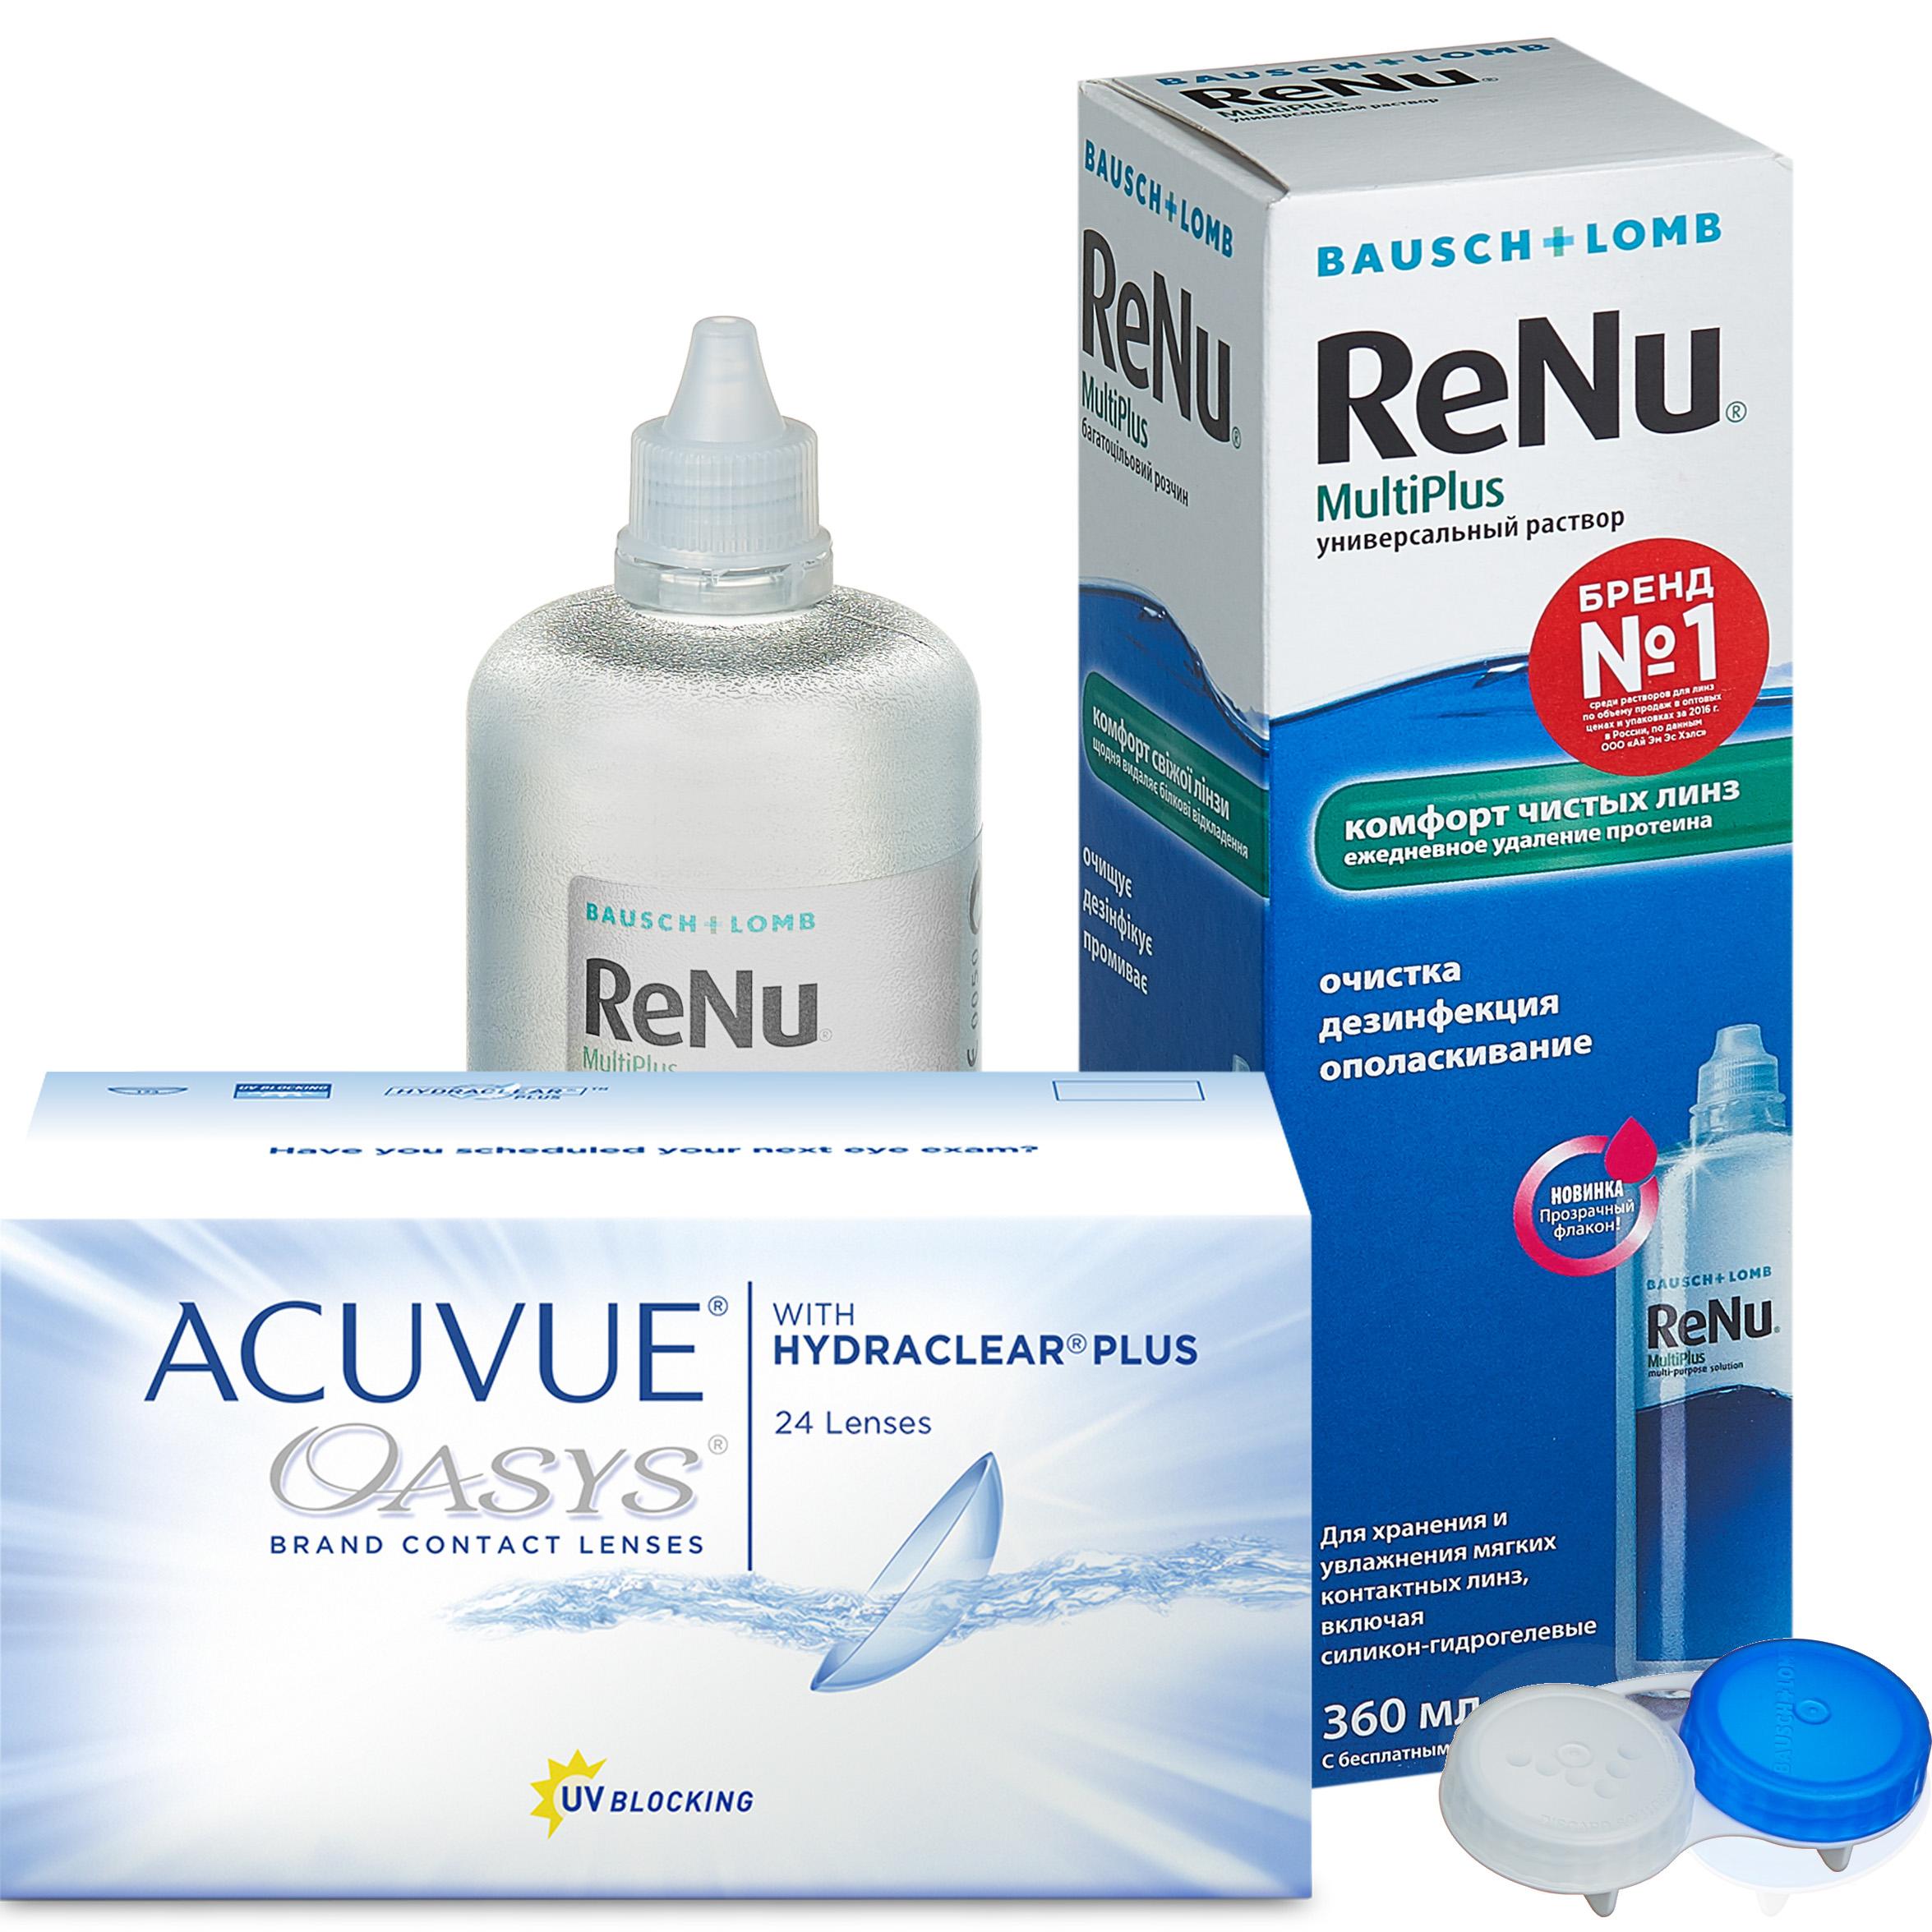 Купить Oasys with Hydraclear Plus 24 линзы + ReNu MultiPlus, Линзы Acuvue Oasys with Hydraclear Plus 24 линзы R 8.8 -7, 00 + ReNu Multi Plus 360 мл